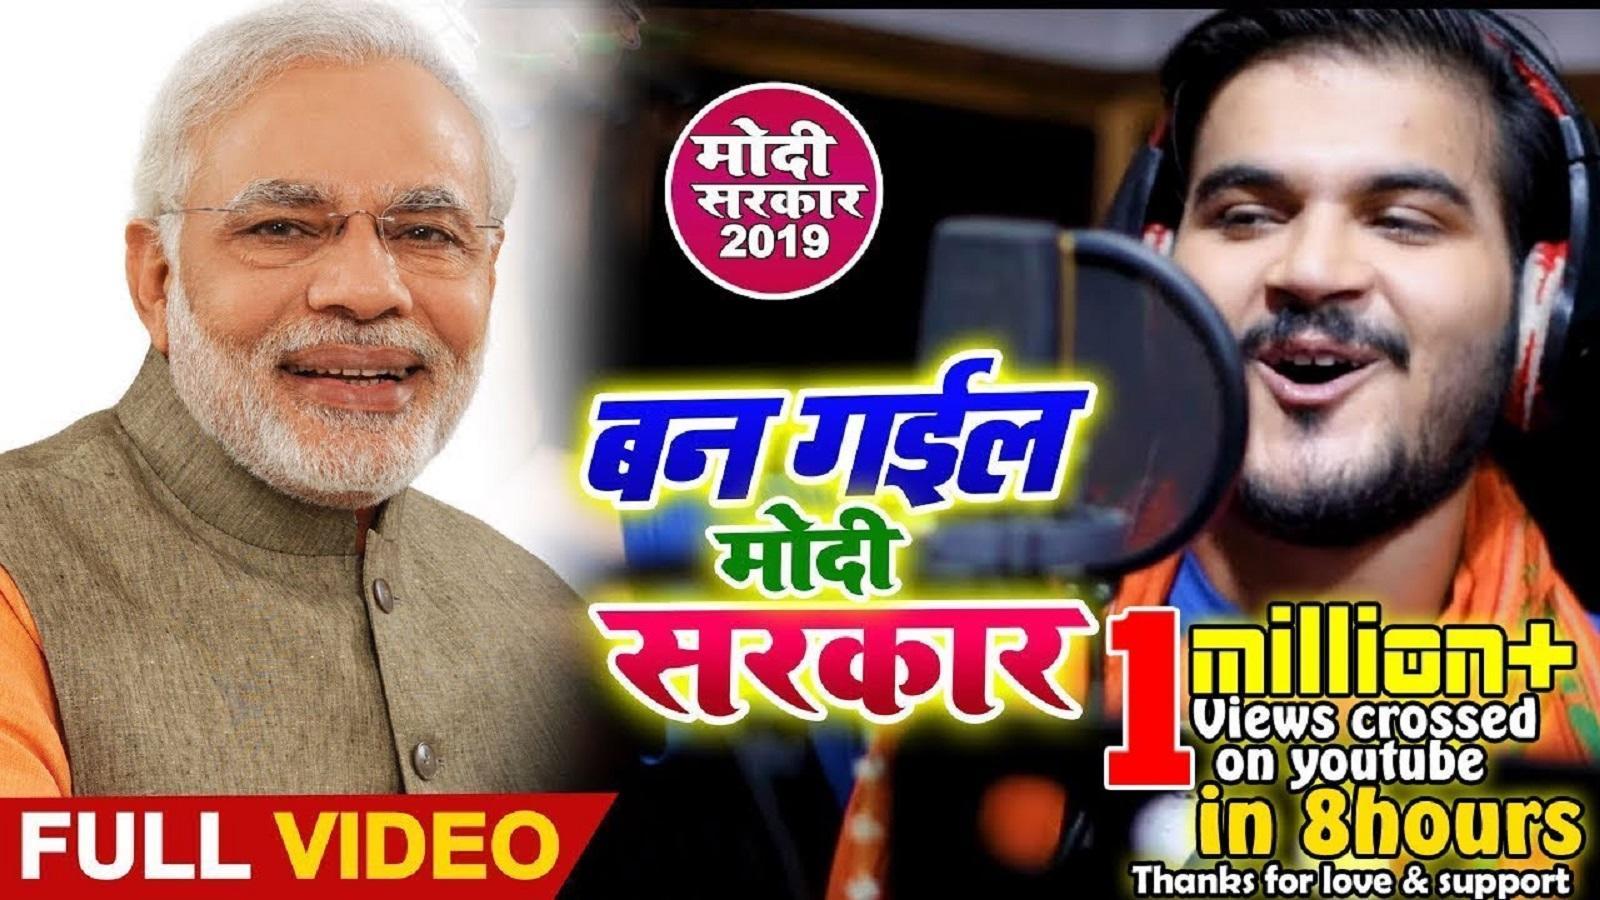 Watch: Arvind Akela Kallu's latest Bhojpuri song 'Ban Gayail Modi Sarkar'